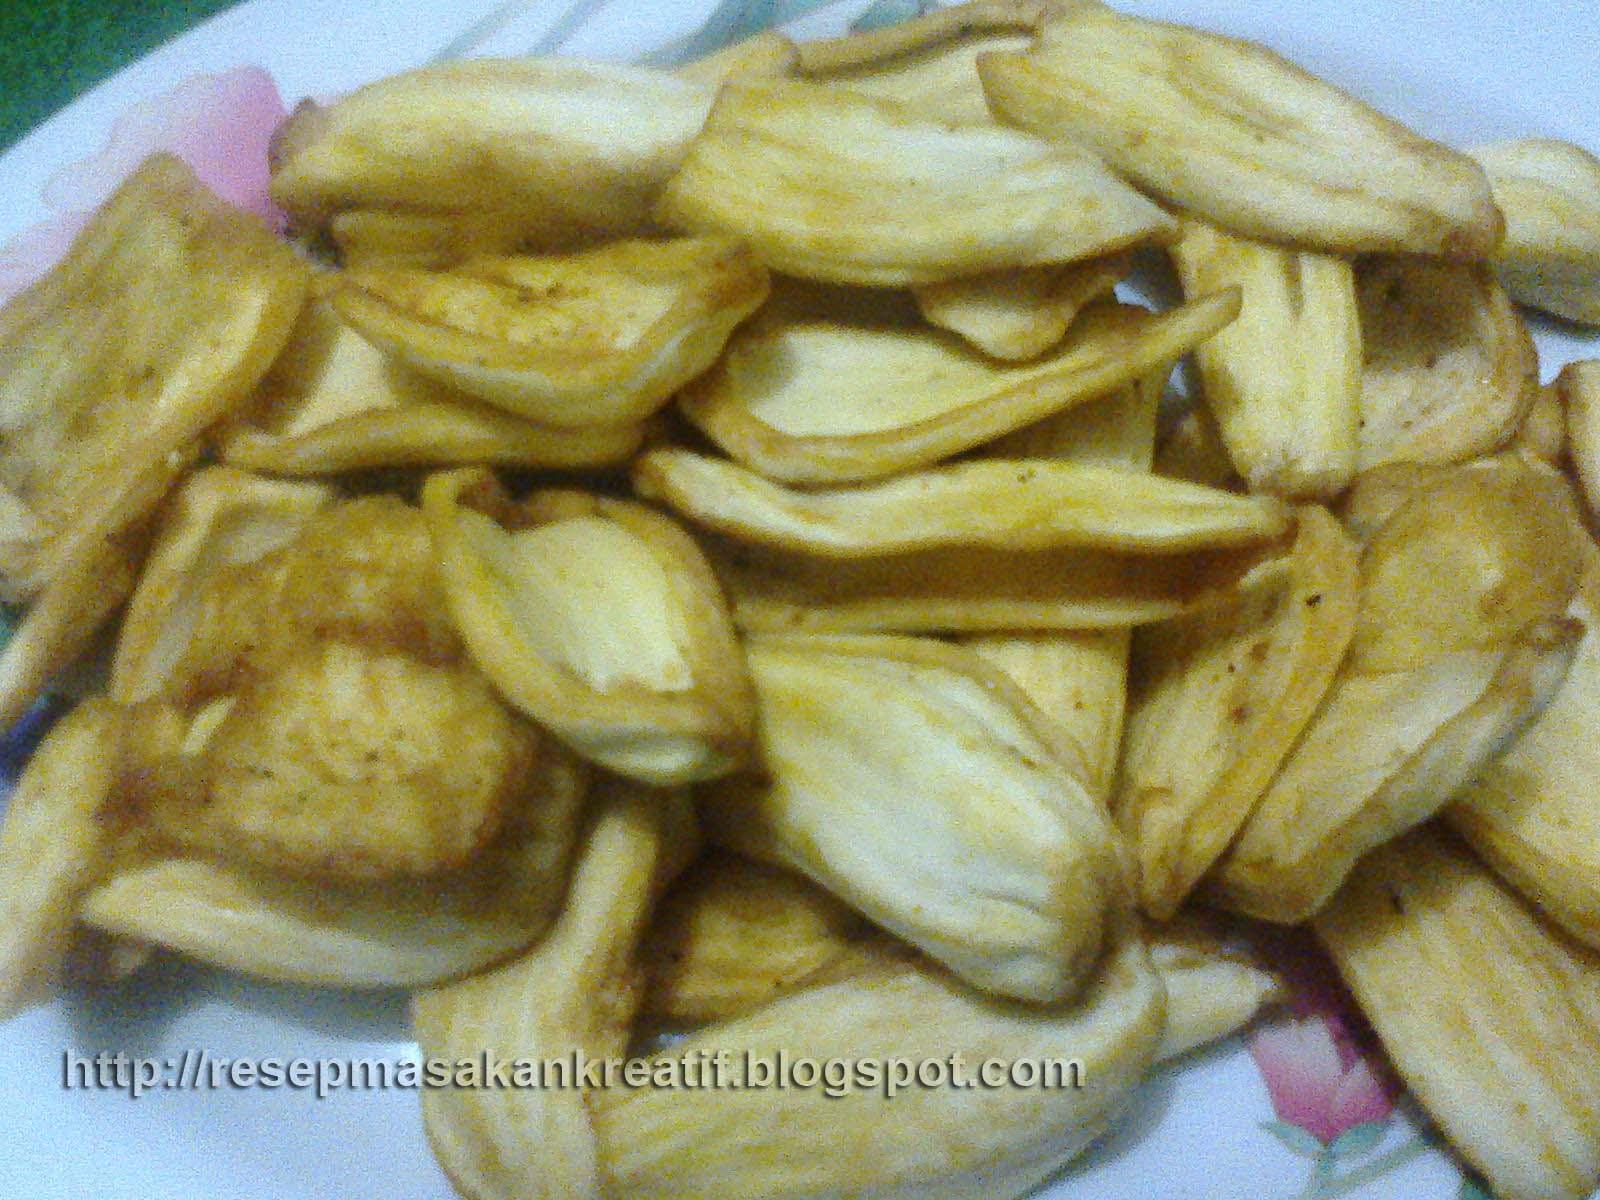 Resep Kue Kering Basah Dan Aneka Roti Cake 2014/page/290 | Star Travel ...